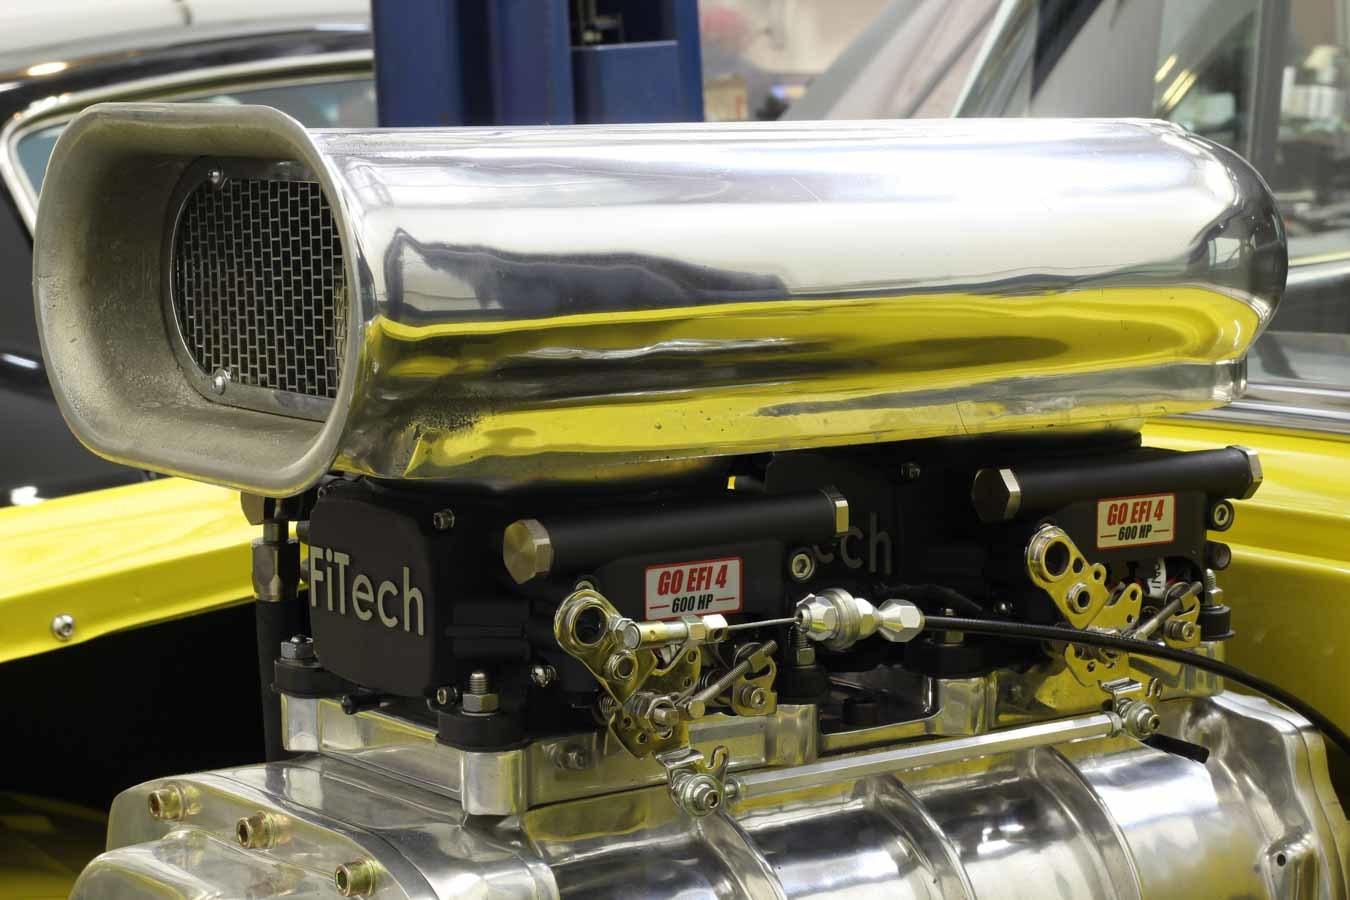 Fitech Fuel Injection 30064 Fuel Injection, Go EFI 2x4 Power Adder, Throttle Body, Square Bore, 70 lb/hr Injectors, Aluminum, Black Anodize, Universal, Kit